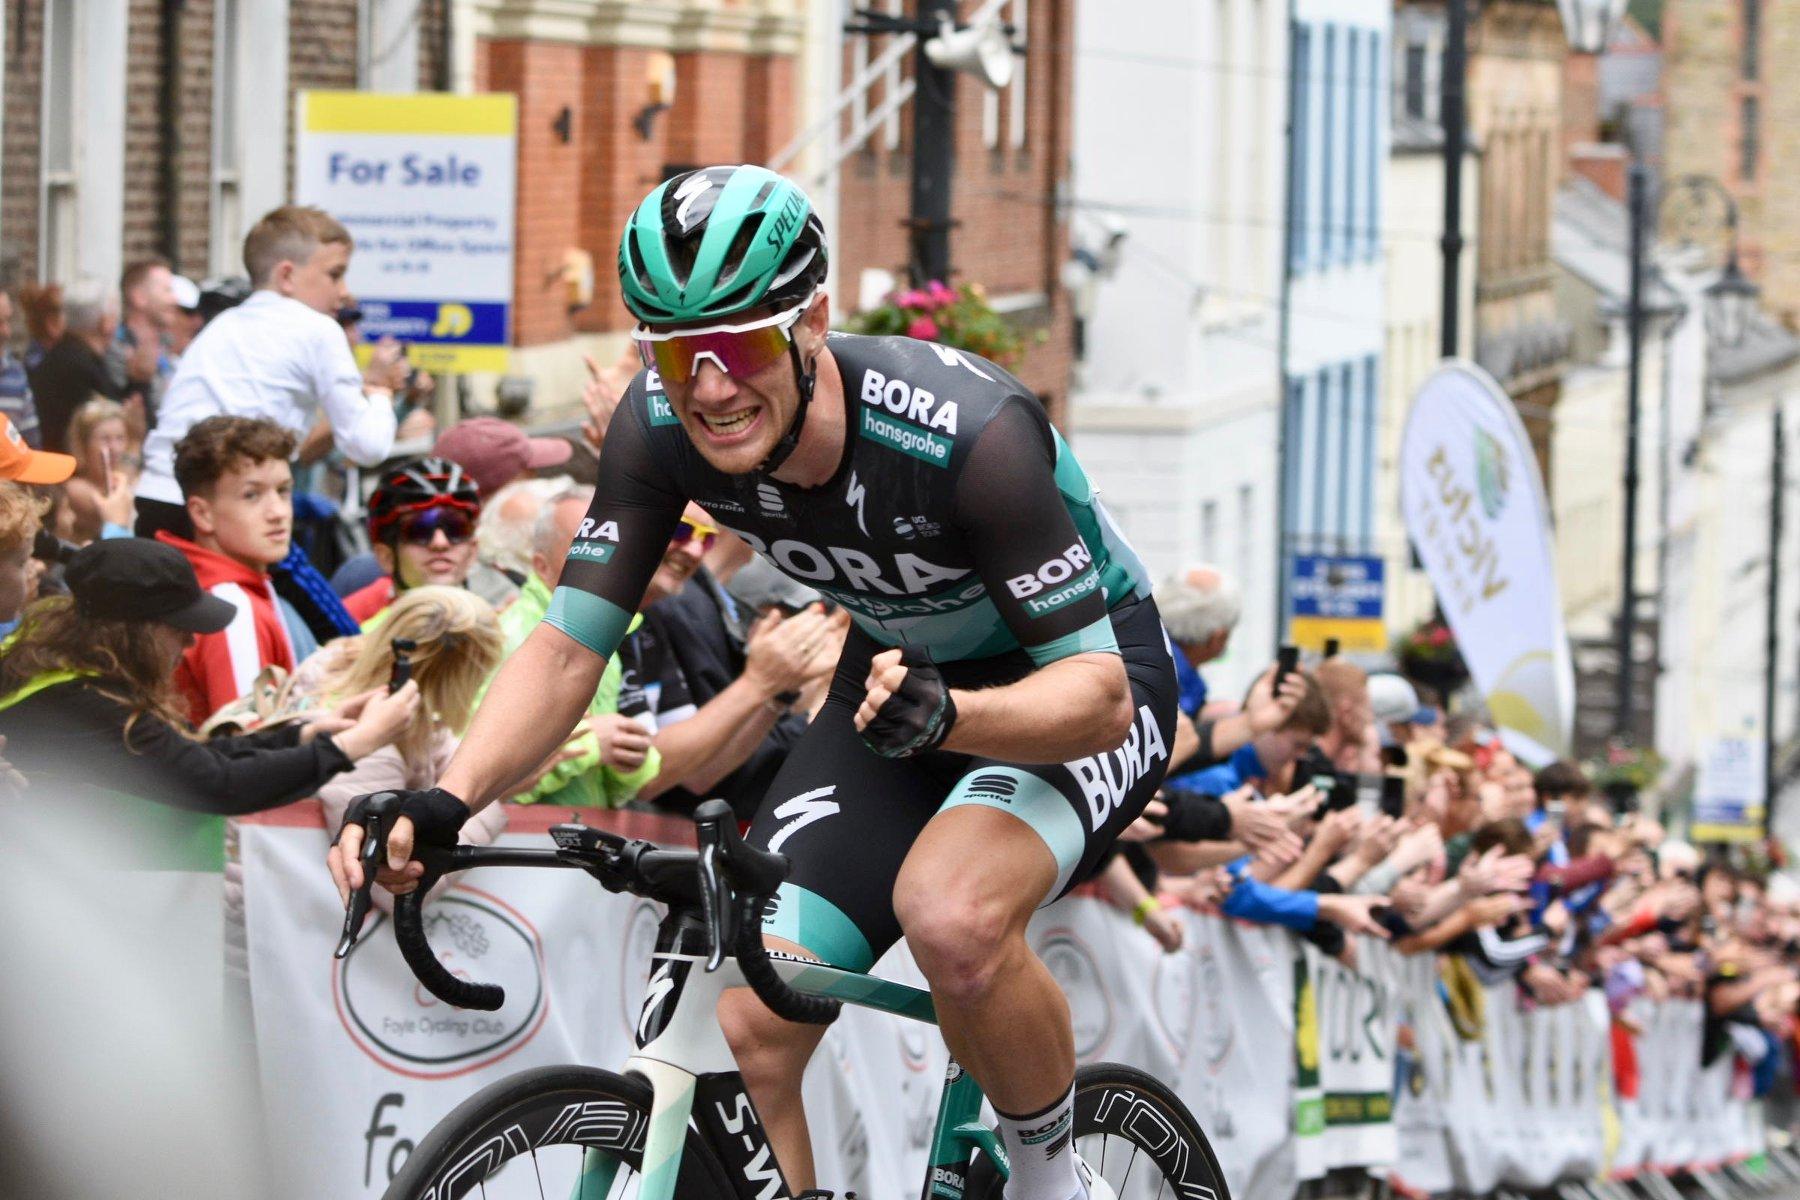 new concept 7c3d7 001bc Sam Bennett as new Irish road race champion: 5 talking ...